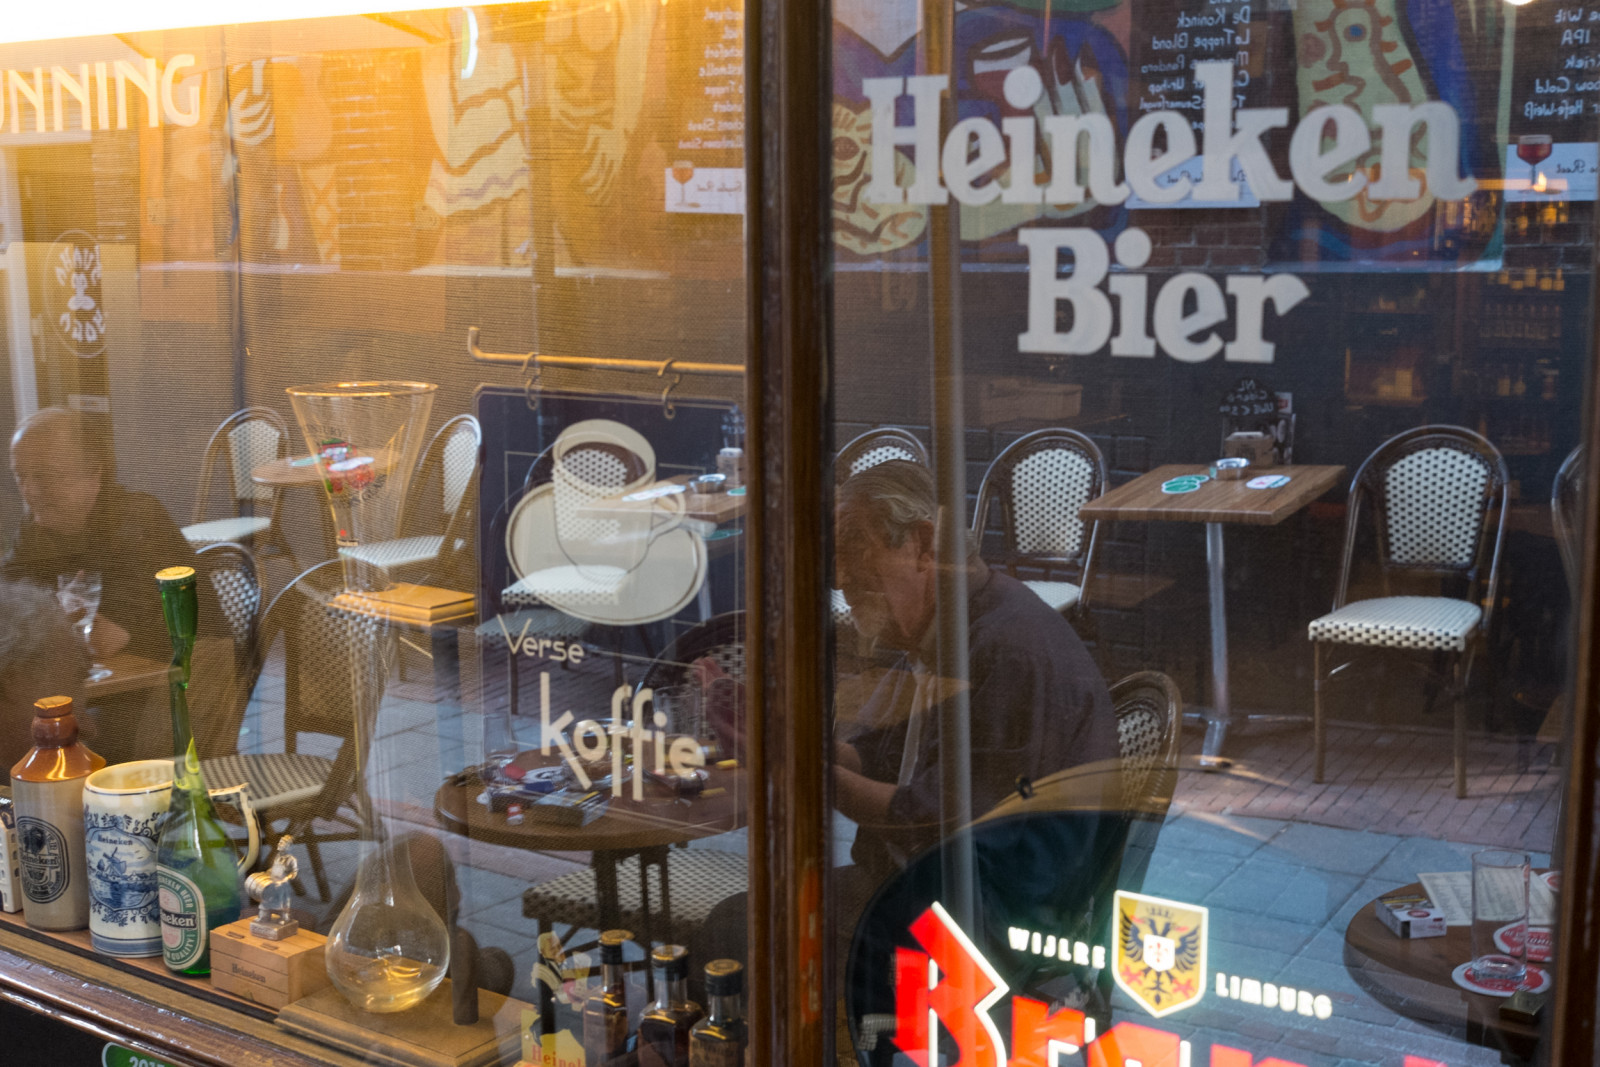 Amsterdam Photo café Heineken